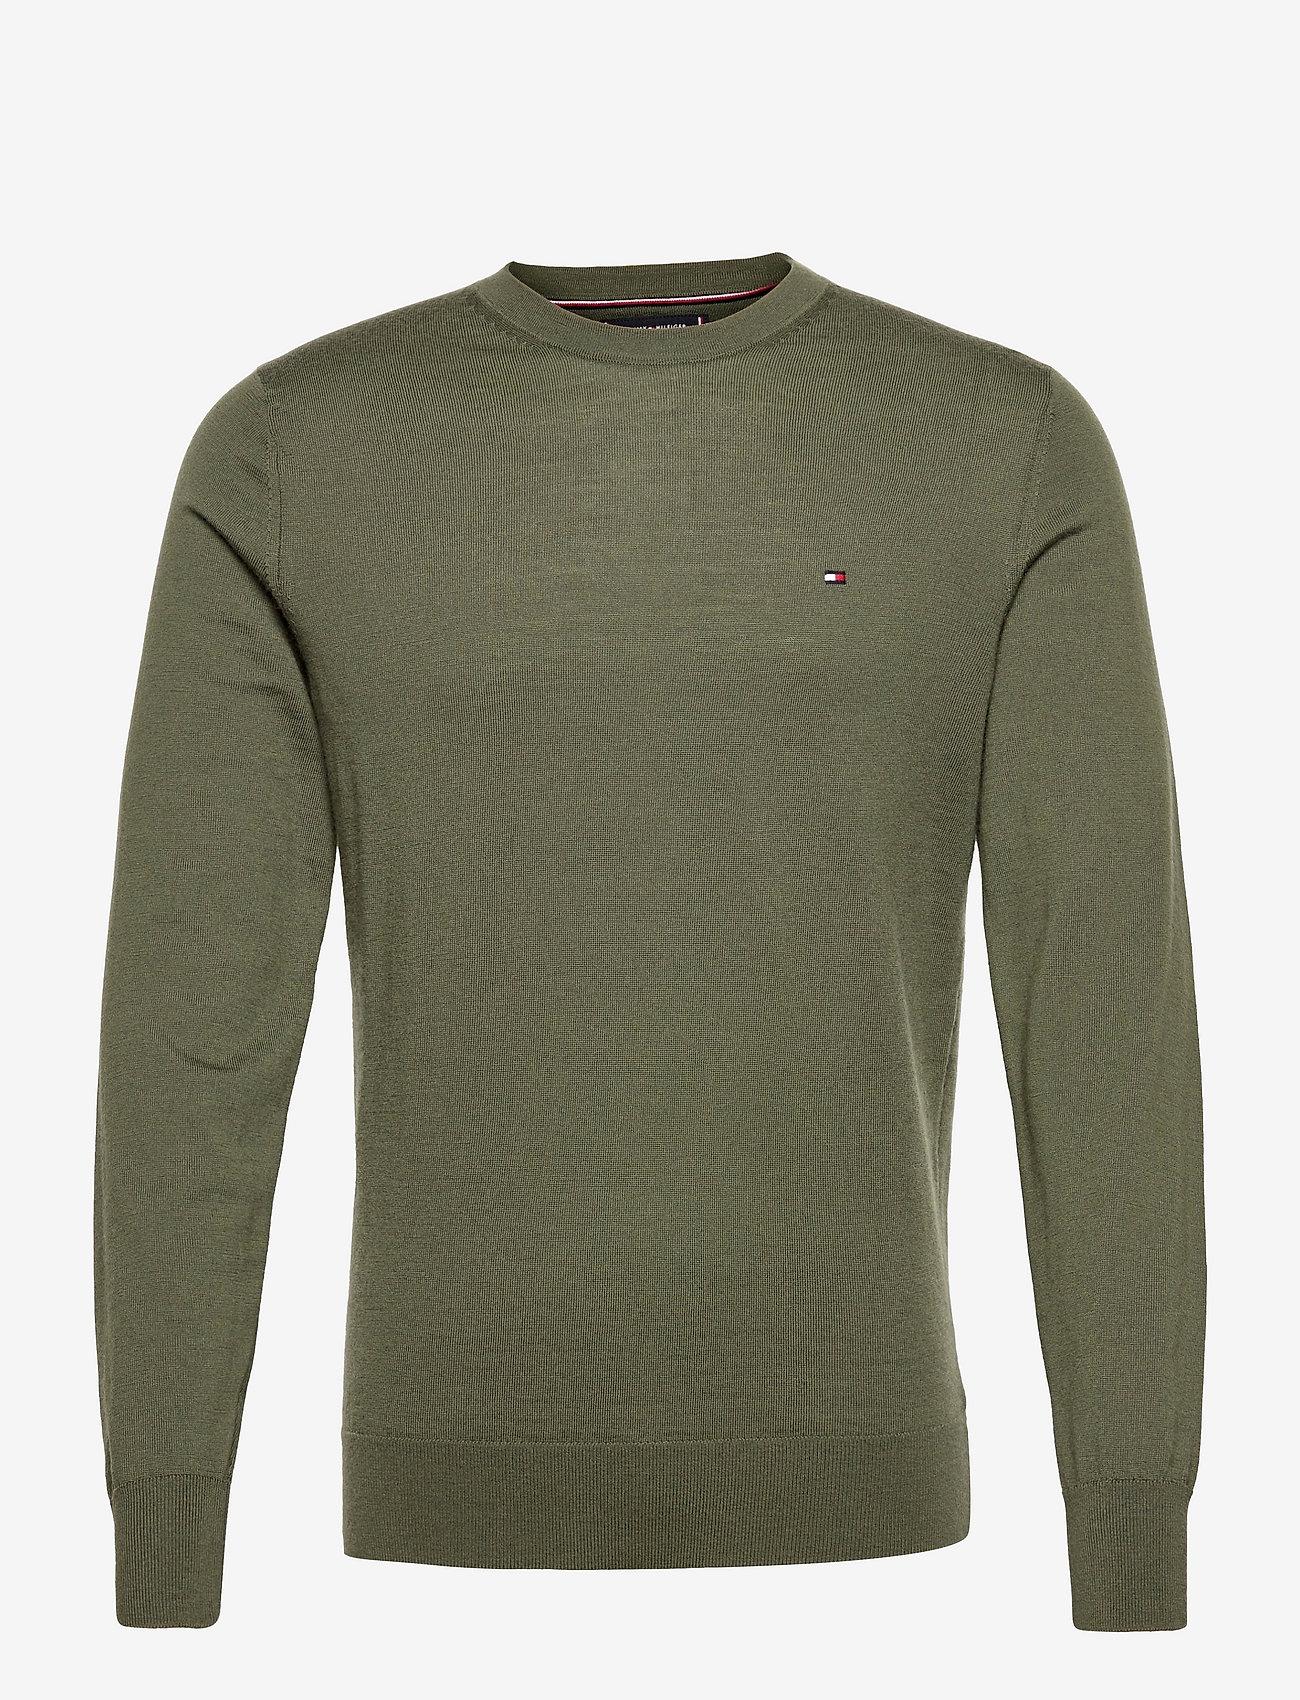 Tommy Hilfiger Tailored - FINE GAUGE MERINO WOOL CREW NECK - basic knitwear - rocky mountain - 0